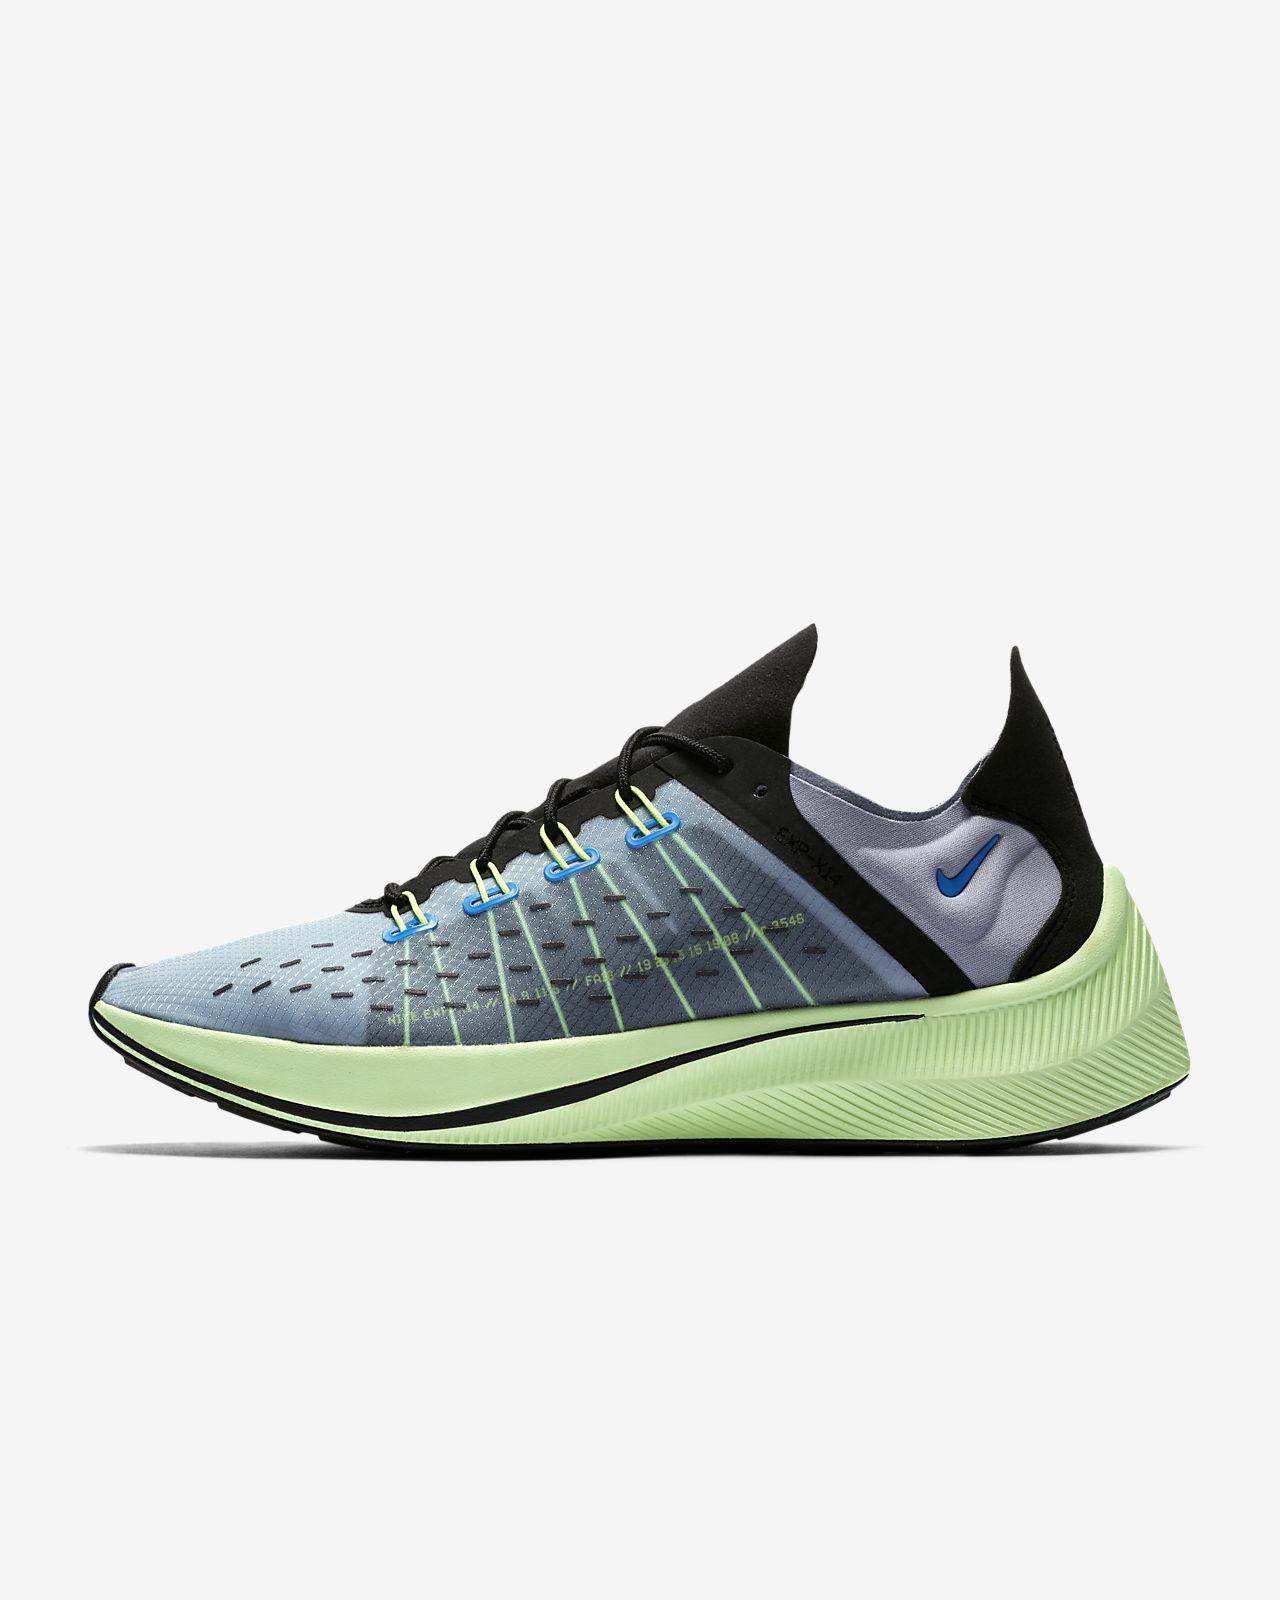 5559a3b427c4 Nike EXP-X14 Men s Shoe. Nike.com